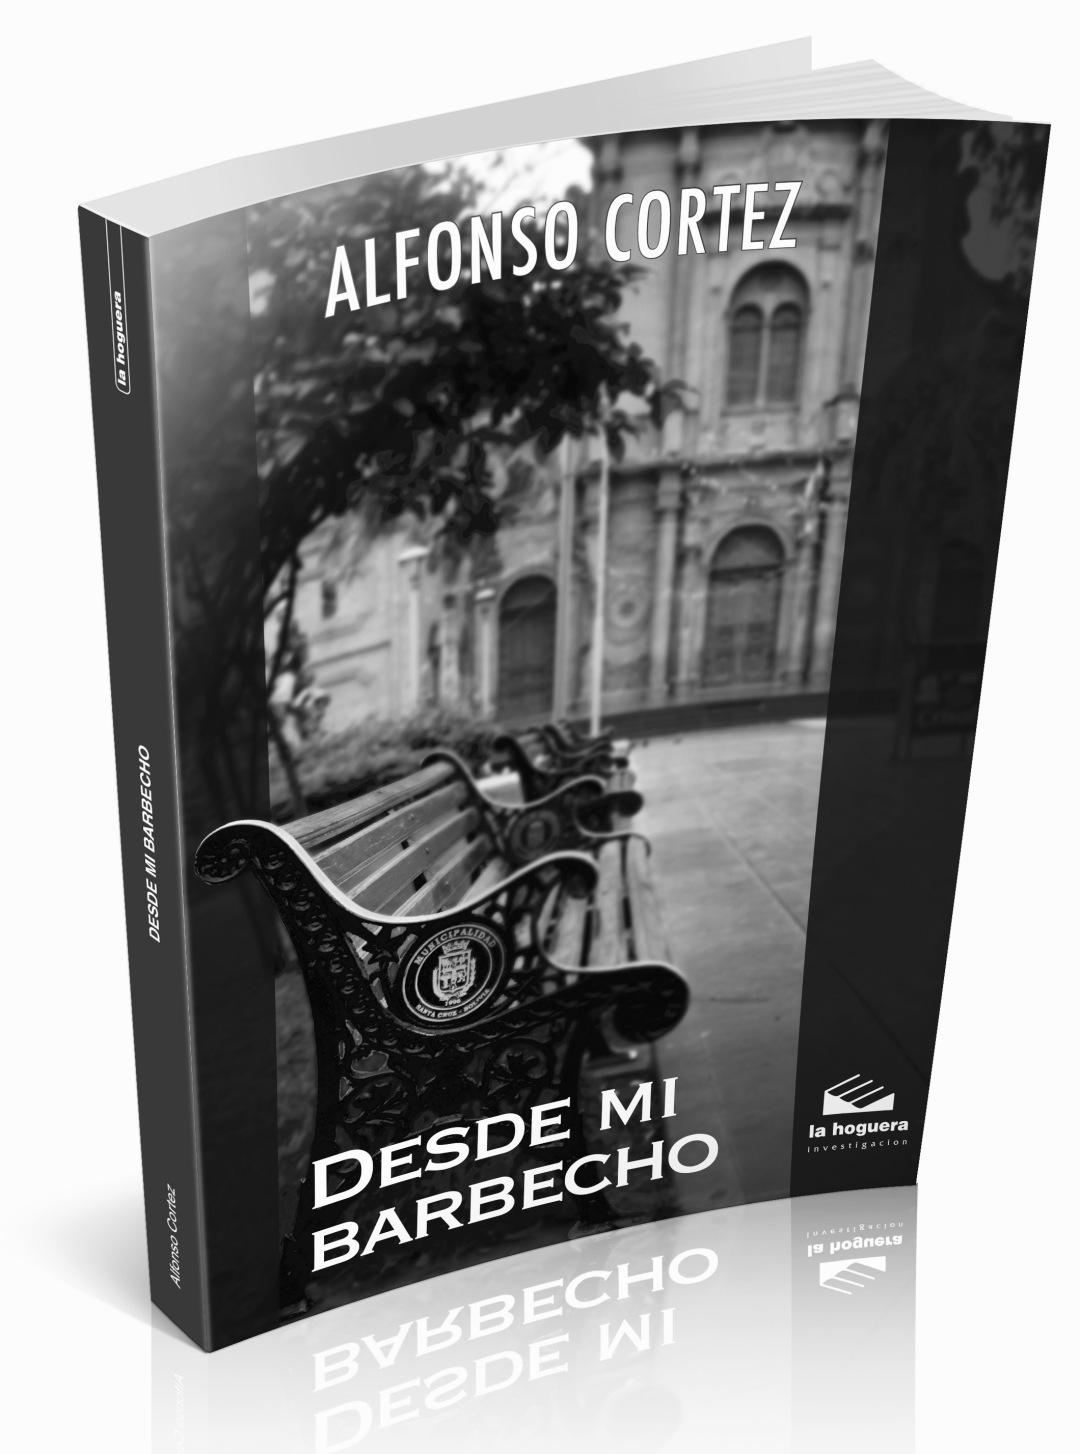 3D DESDE MI BARBECHO Alfonso Cortez 1ra Ed 2018 (1)